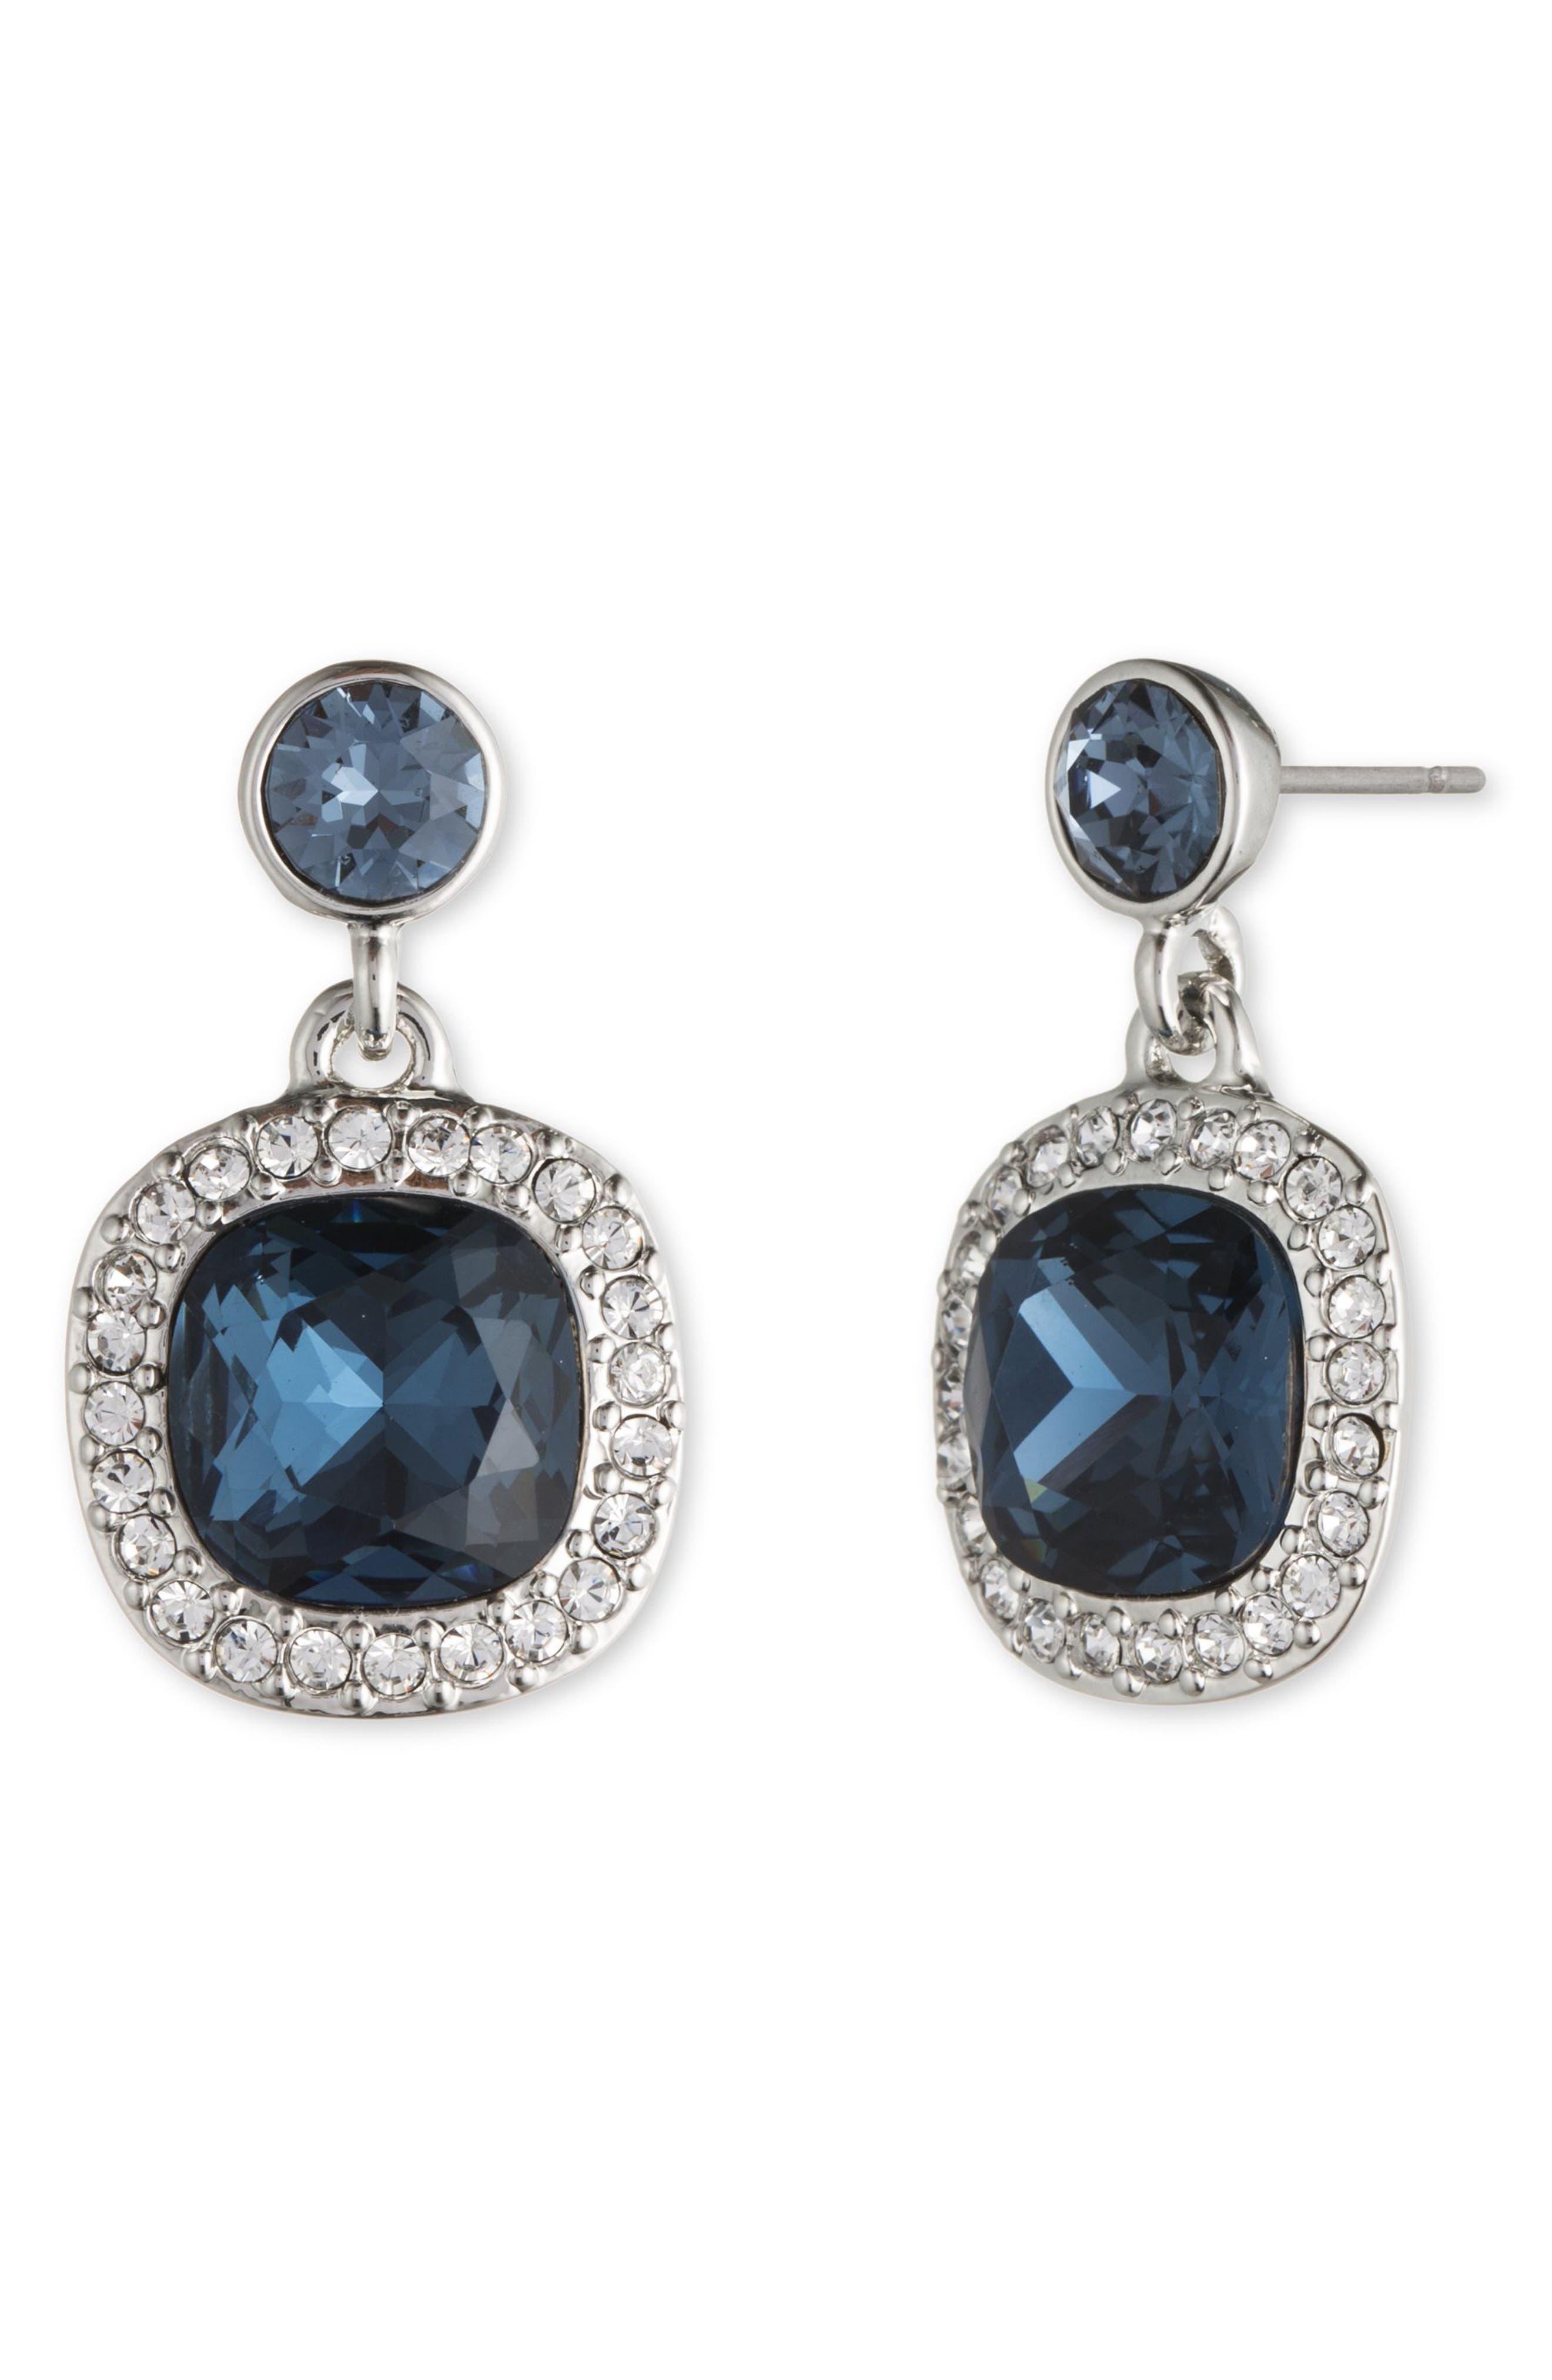 Crystal Drop Earrings,                             Main thumbnail 1, color,                             DENIM / SILVER